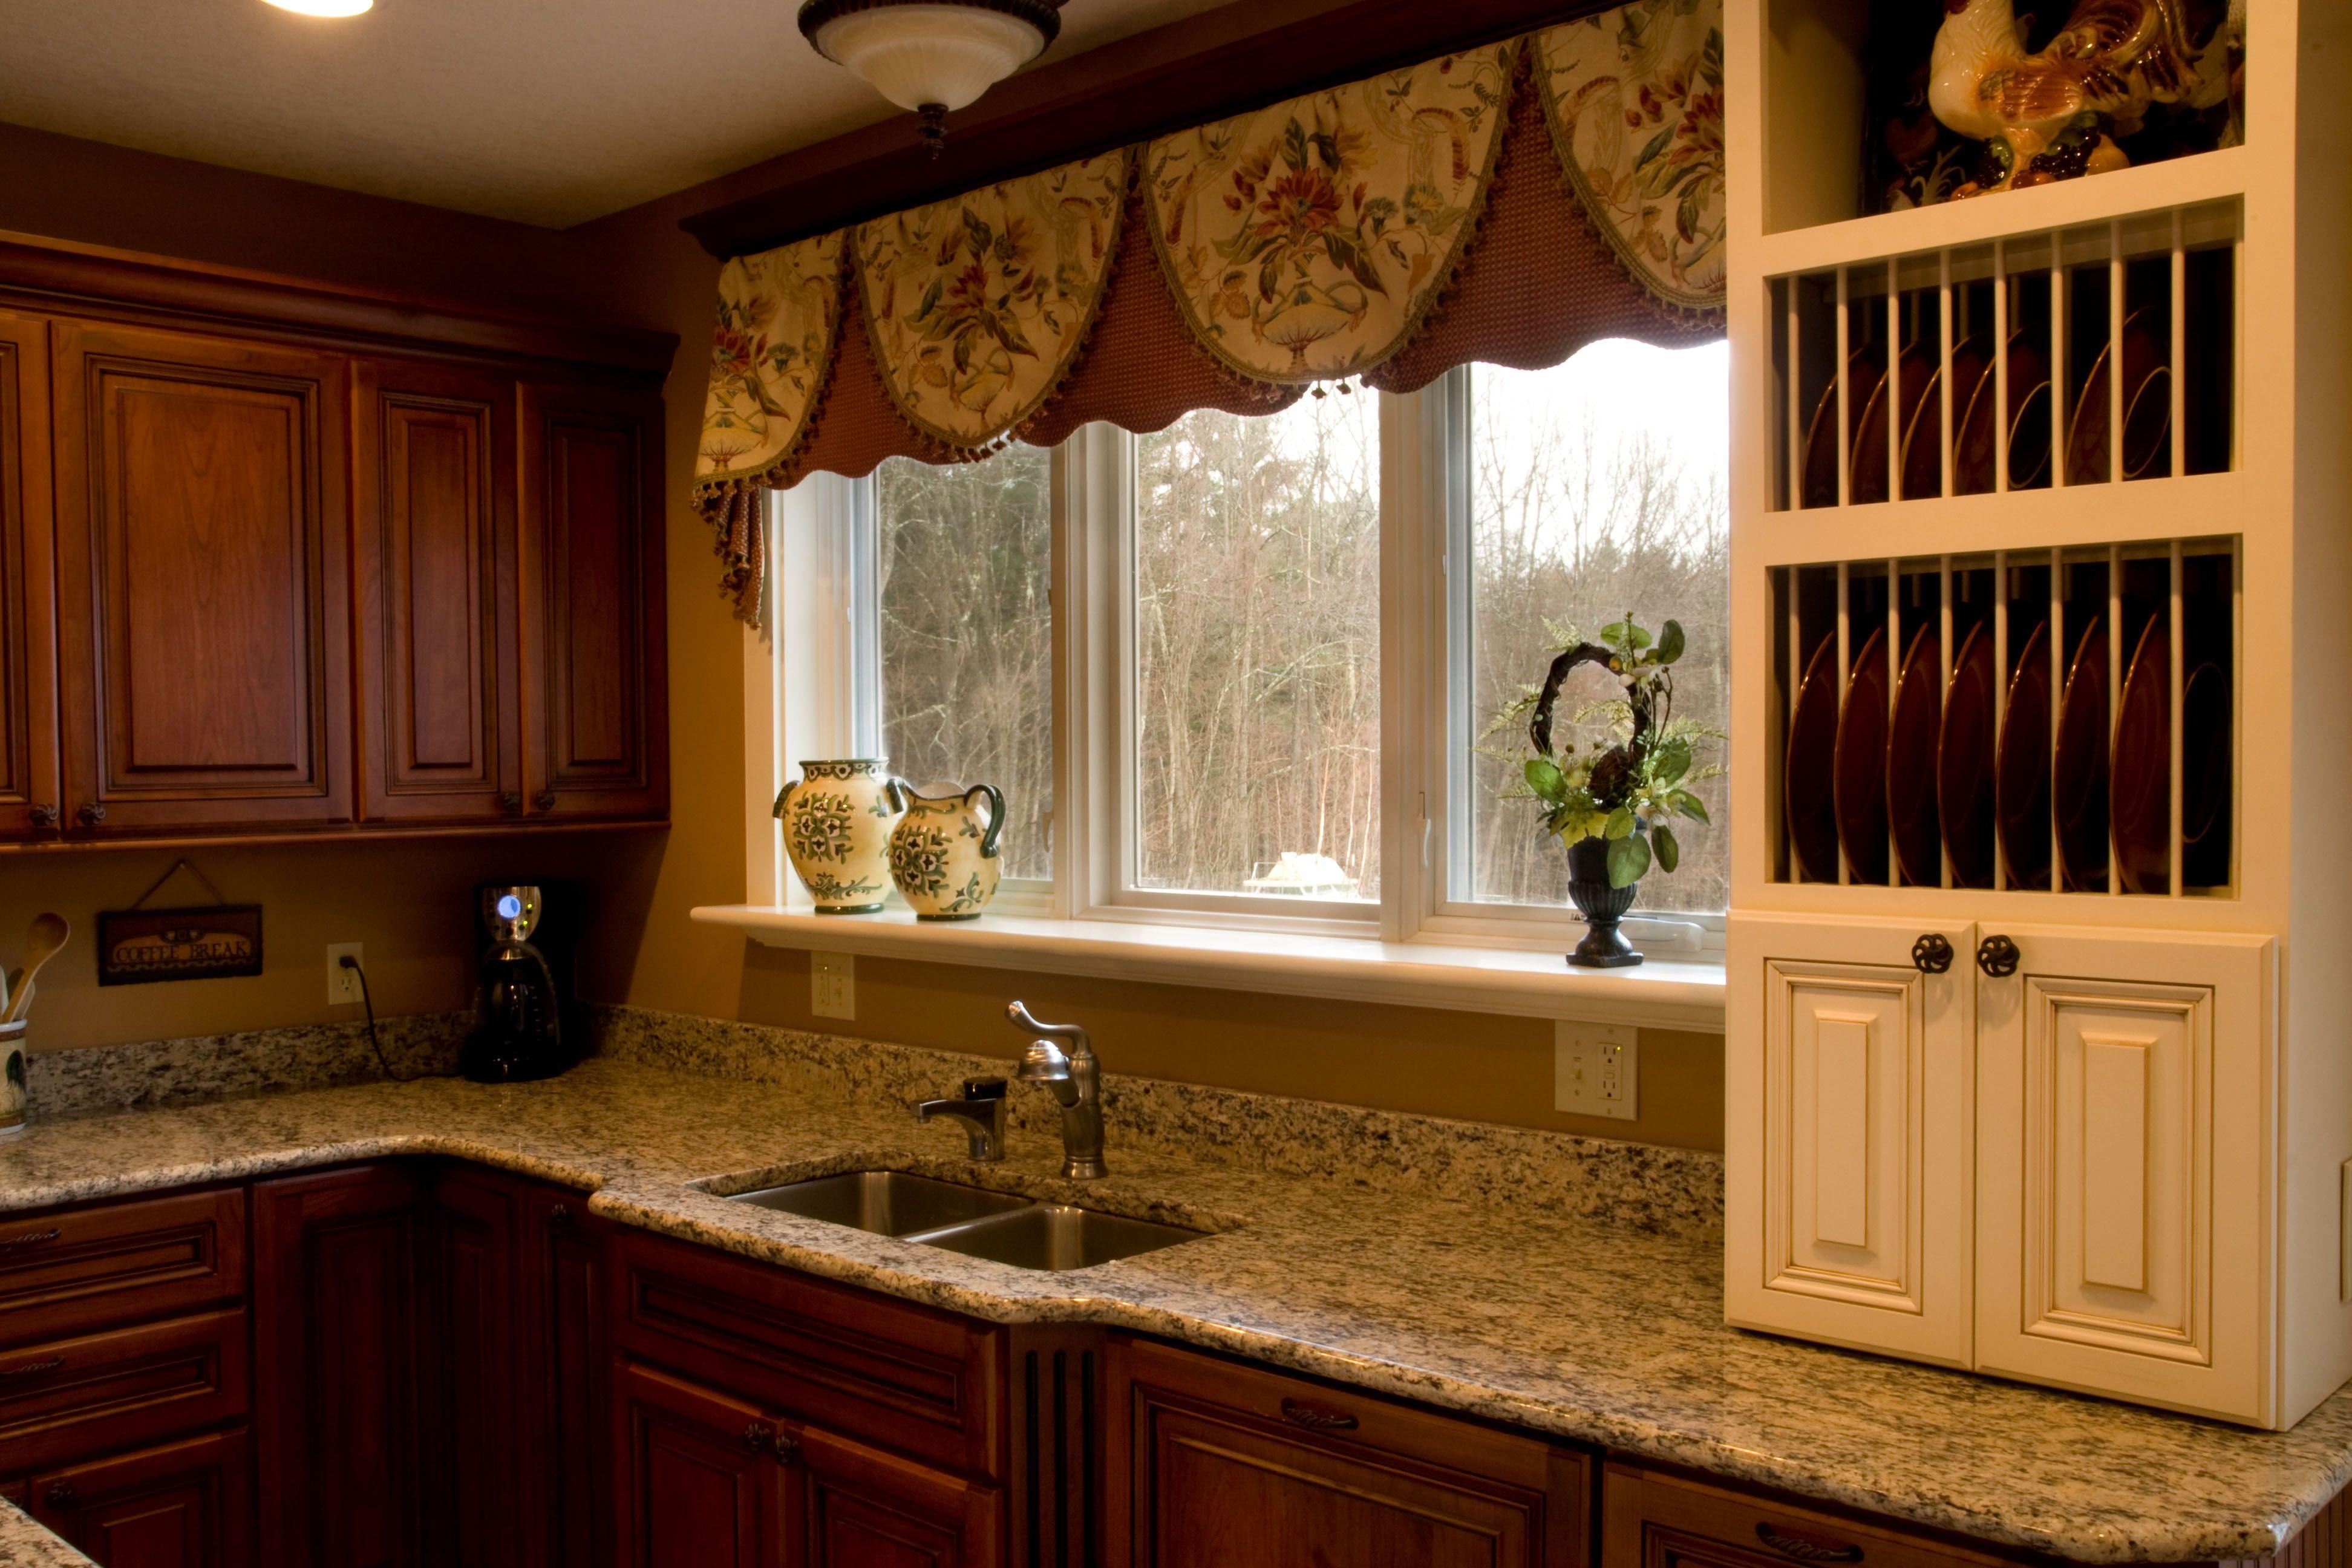 Kitchen window curtains - 17 Best Images About Kitchen Window Treatments On Pinterest Kitchens Valance Ideas And Fabrics